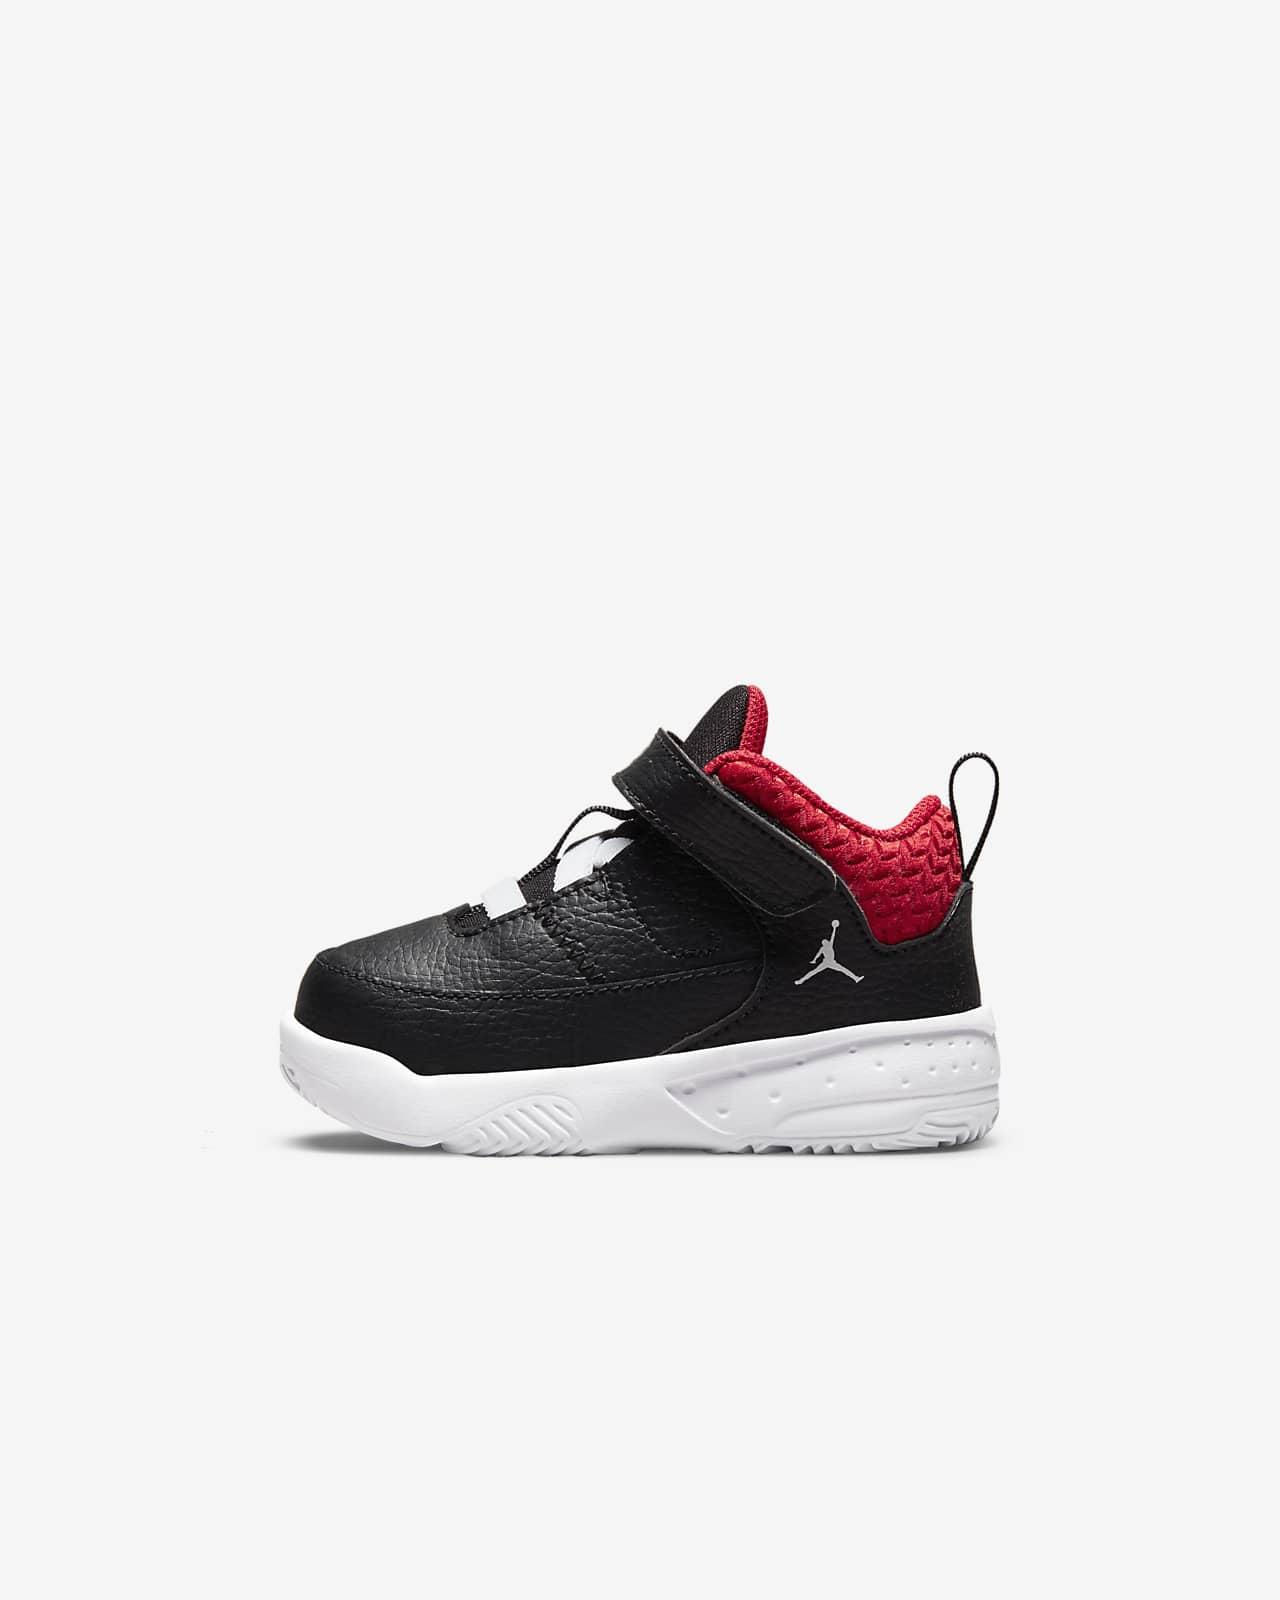 Jordan Max Aura 3 Baby/Toddler Shoes